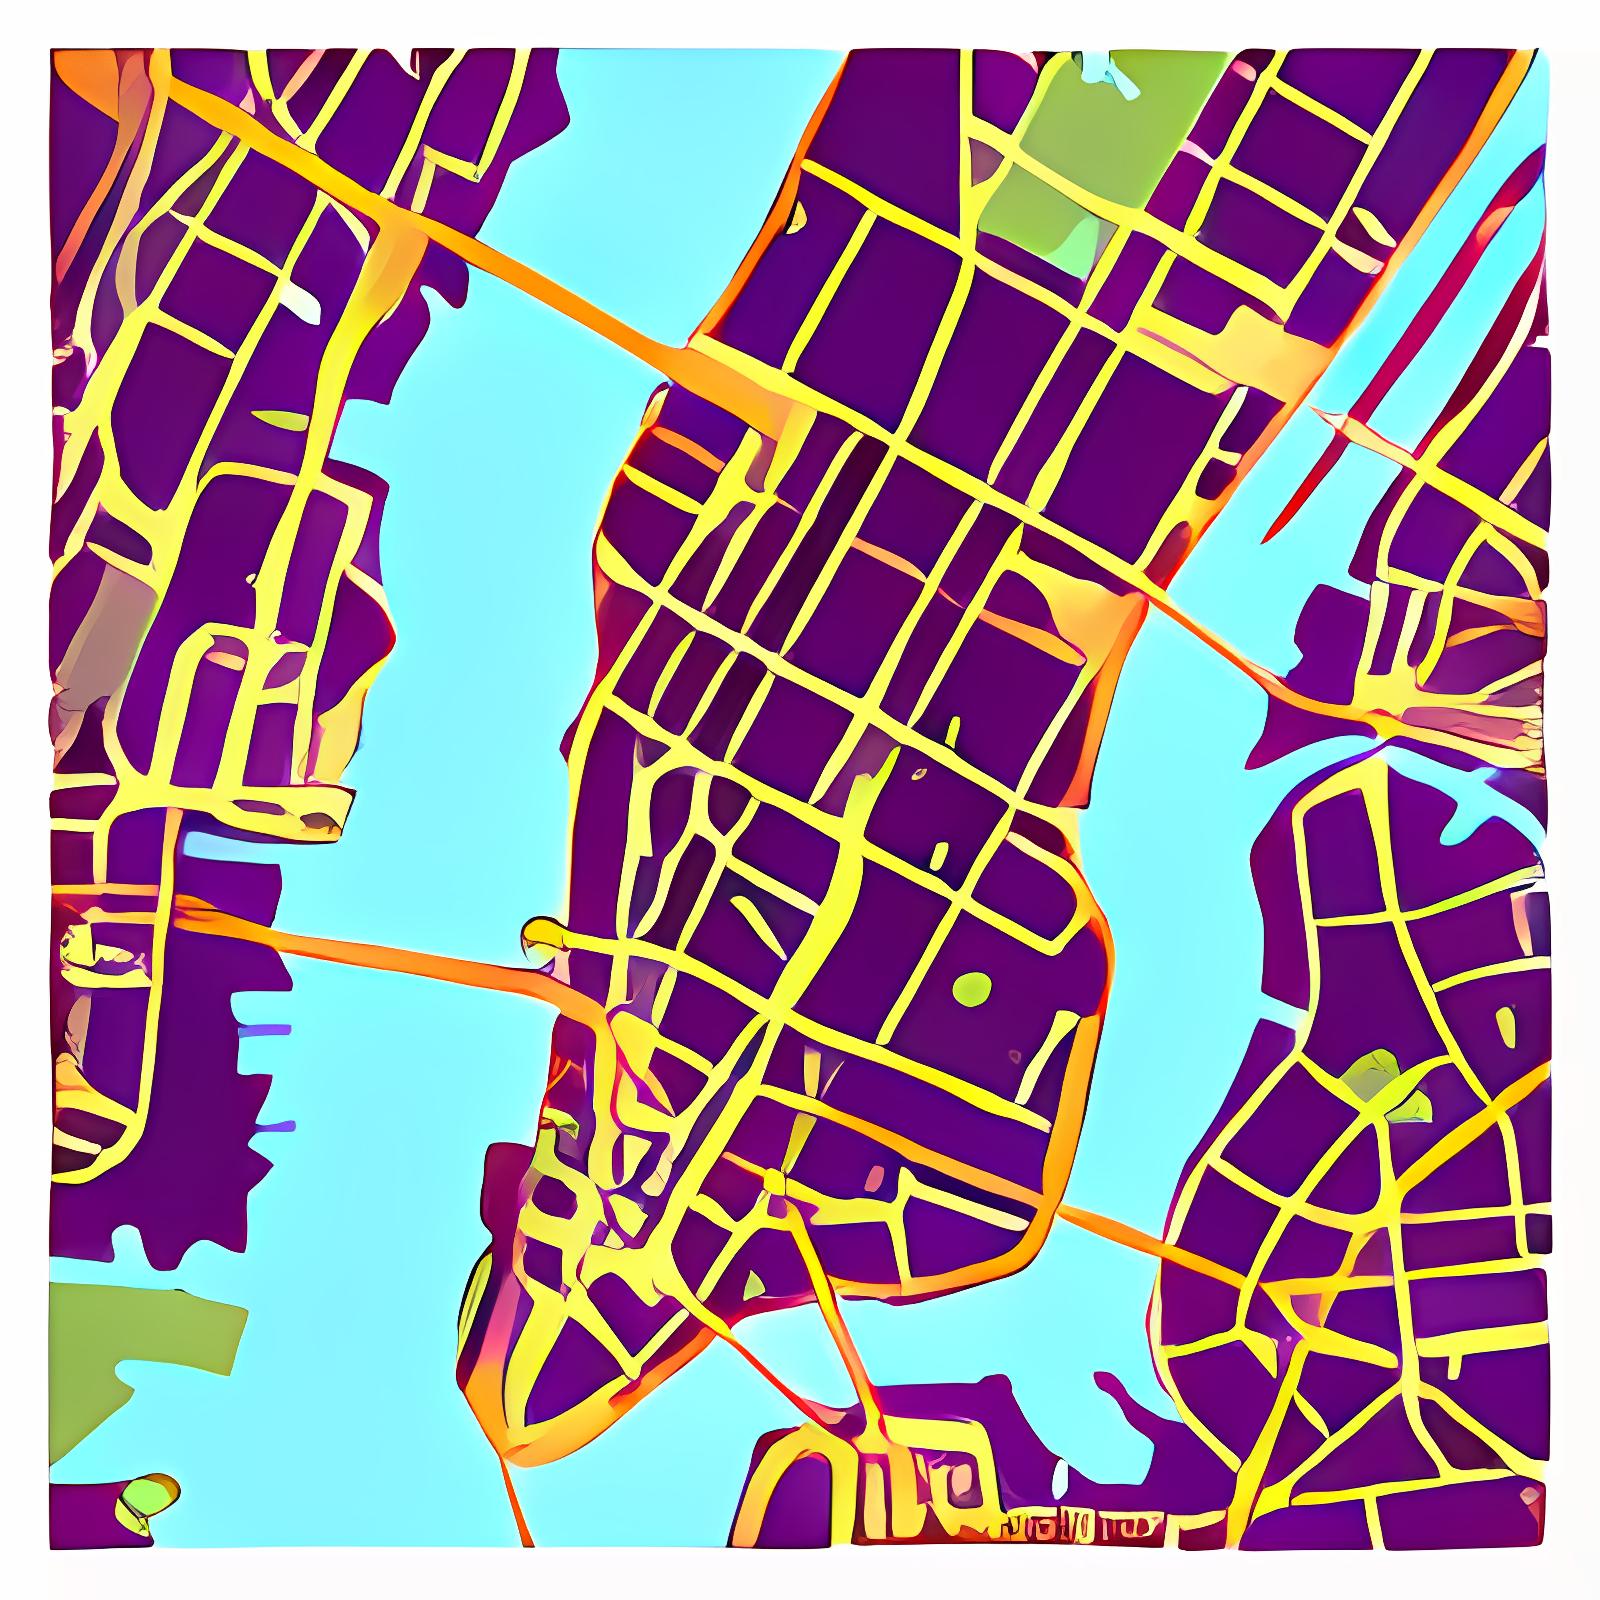 Schmap New York Guide 2.0